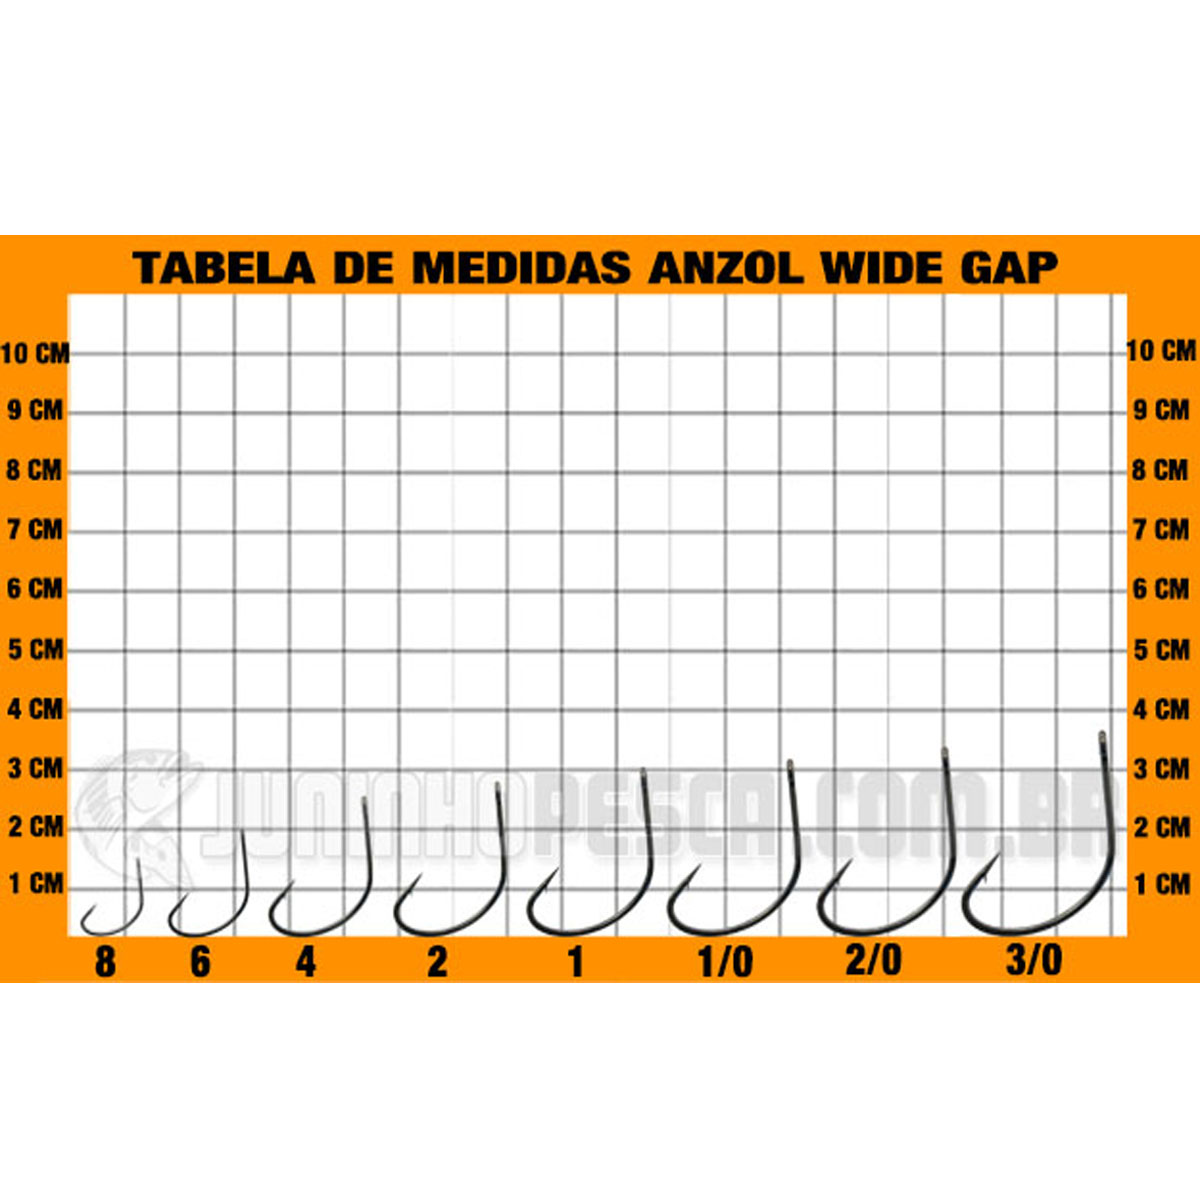 Anzol Pinnacle Wide Gap nº 08  - Pró Pesca Shop